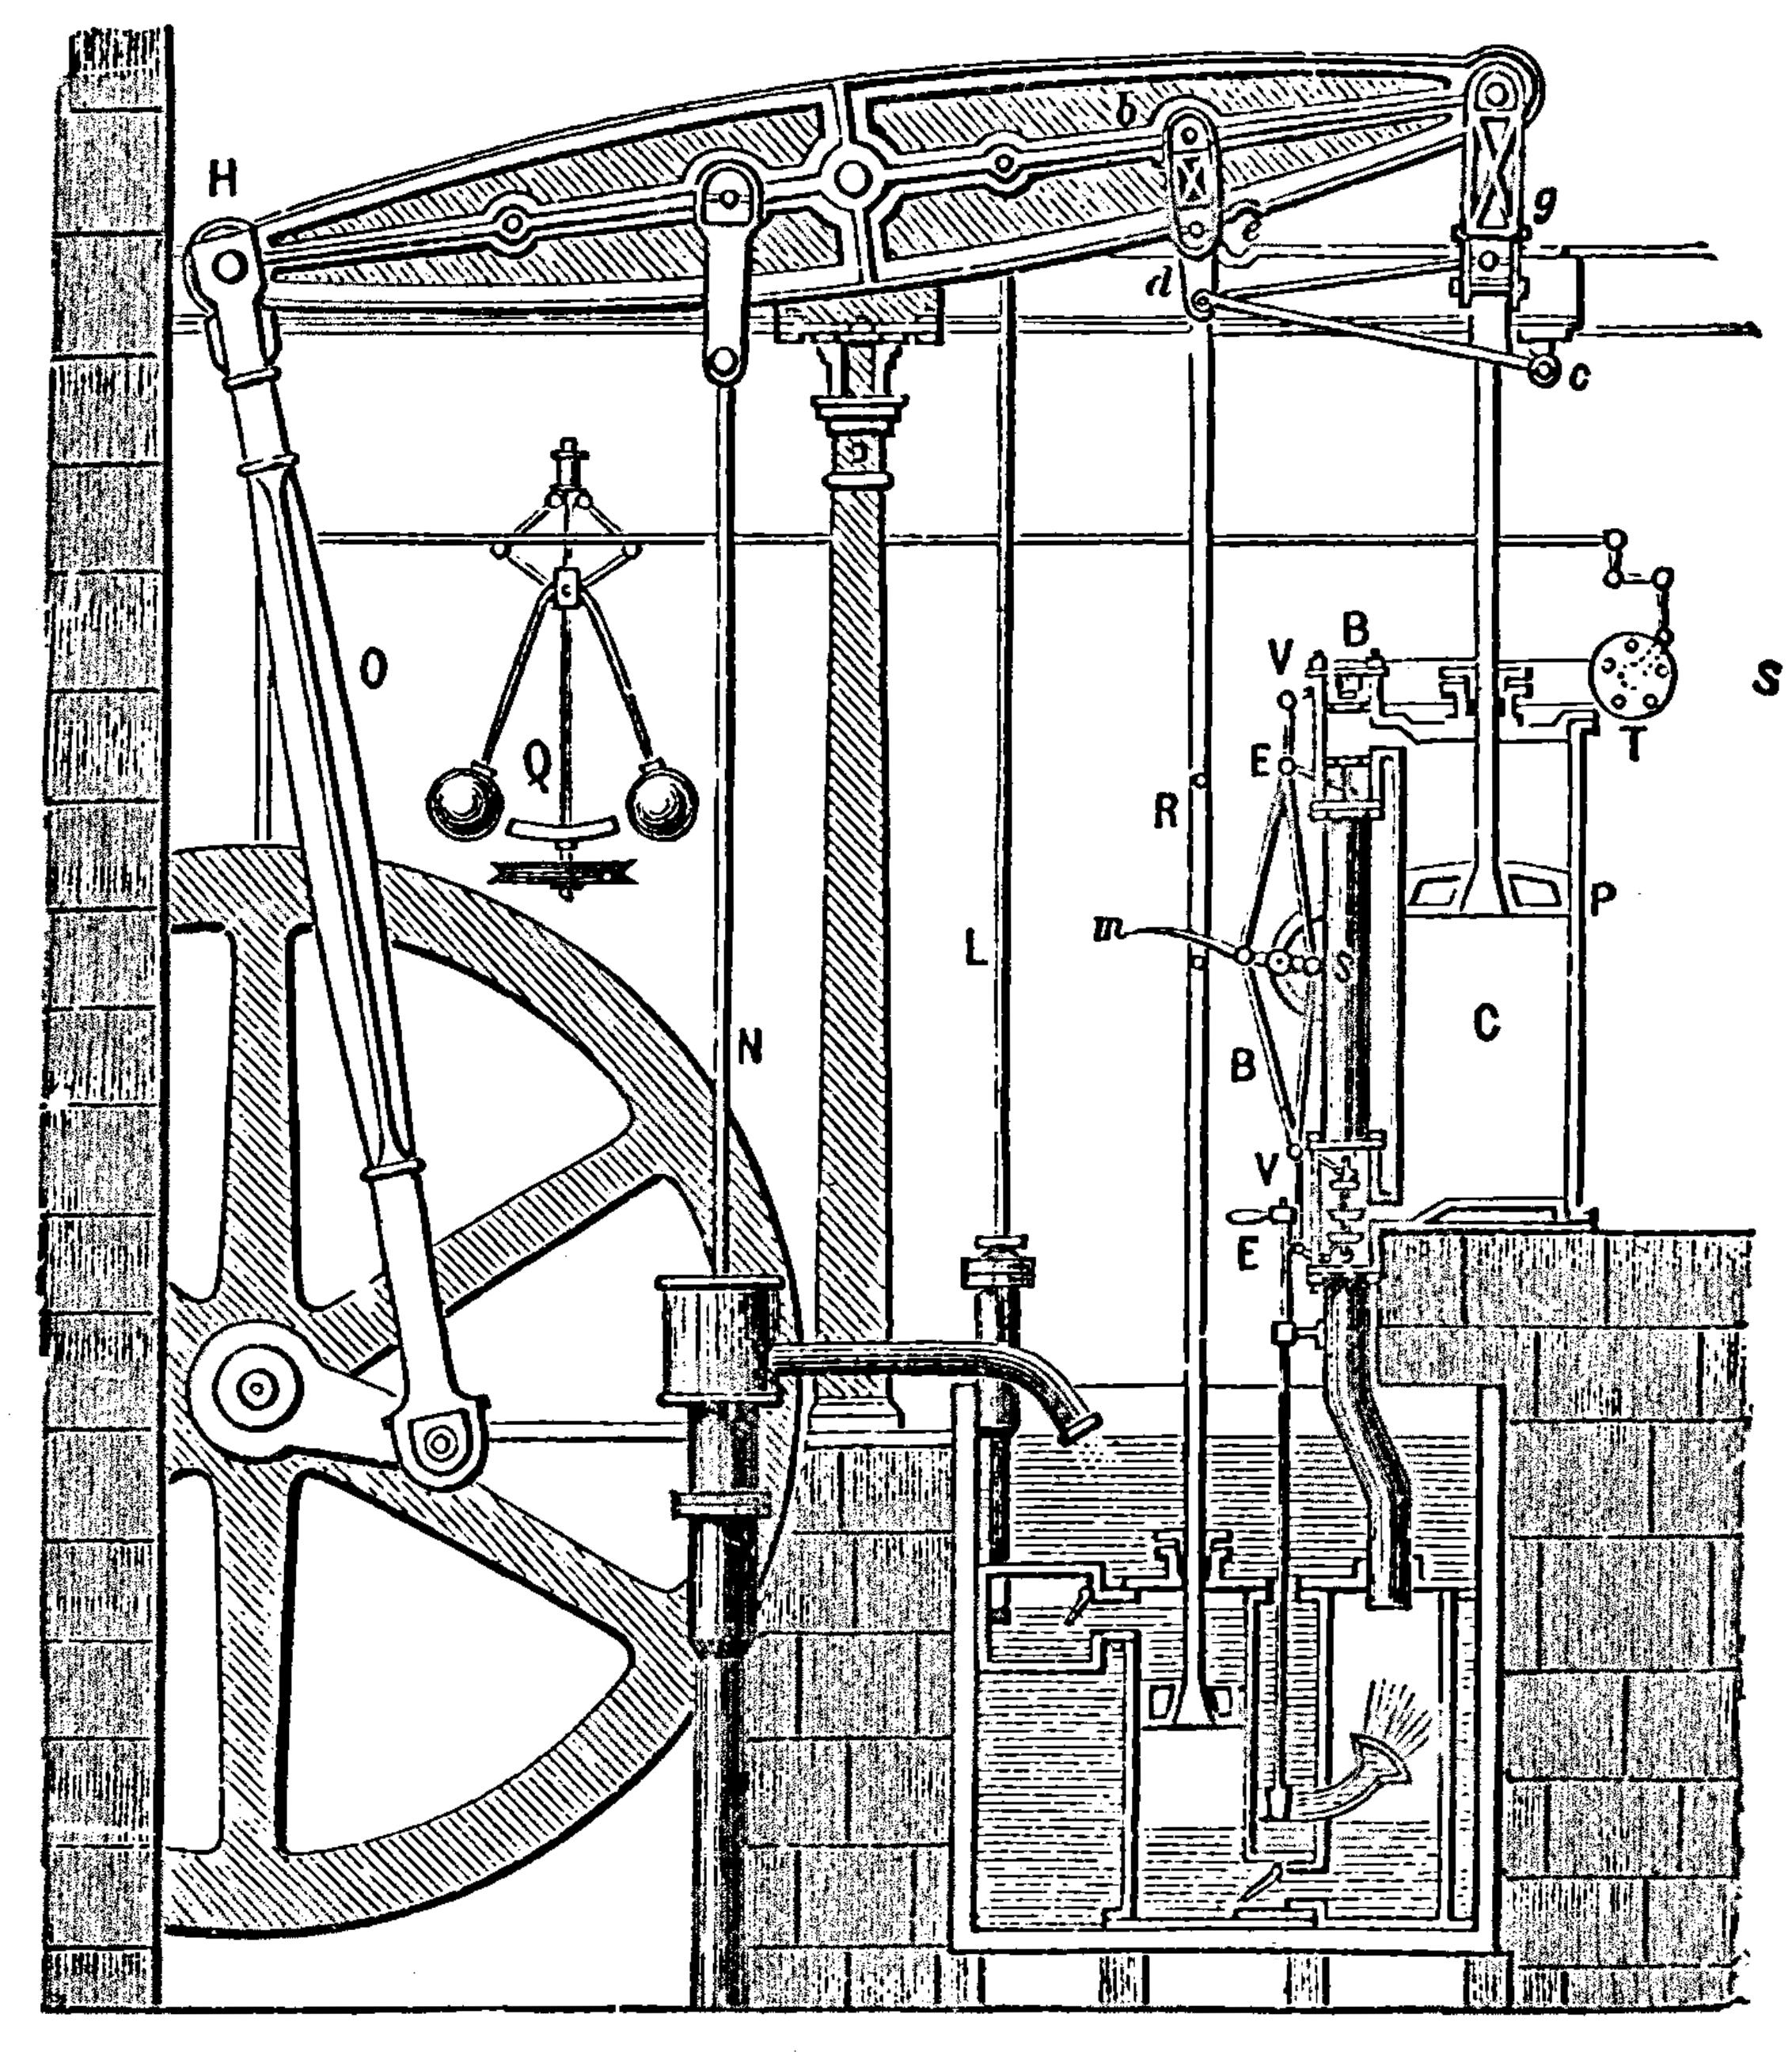 Rigid body dynamics - Wikipedia